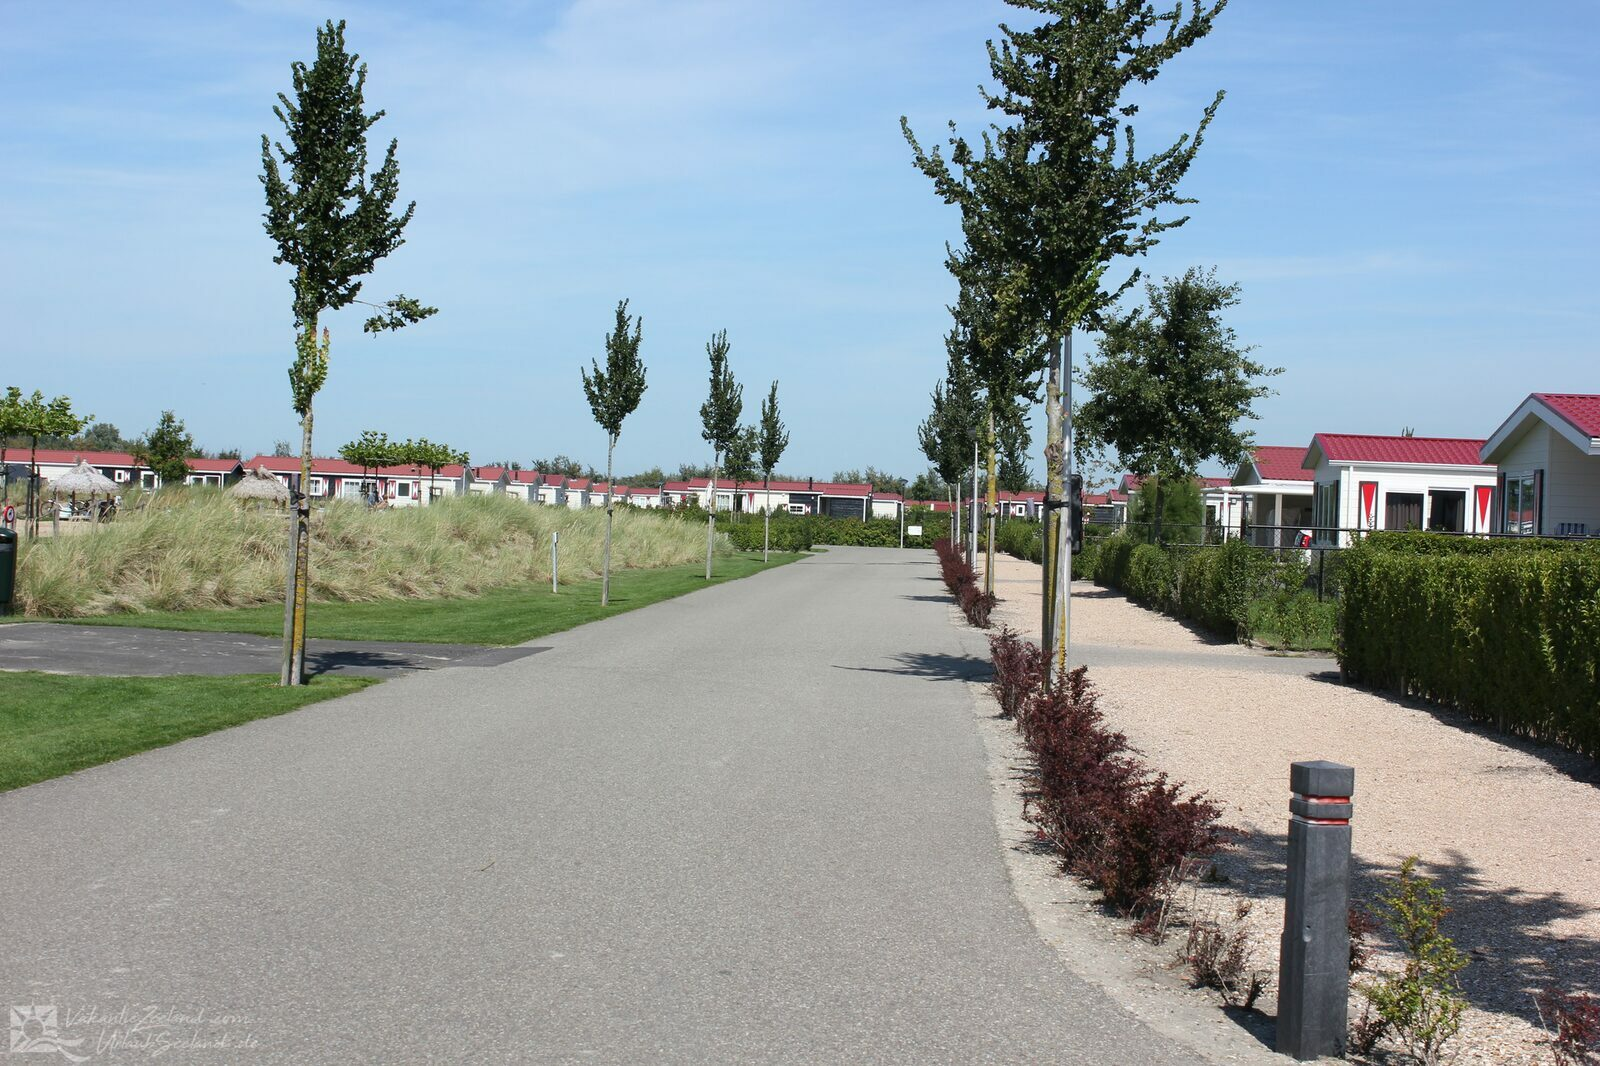 VZ971 Vakantiechalet in Serooskerke